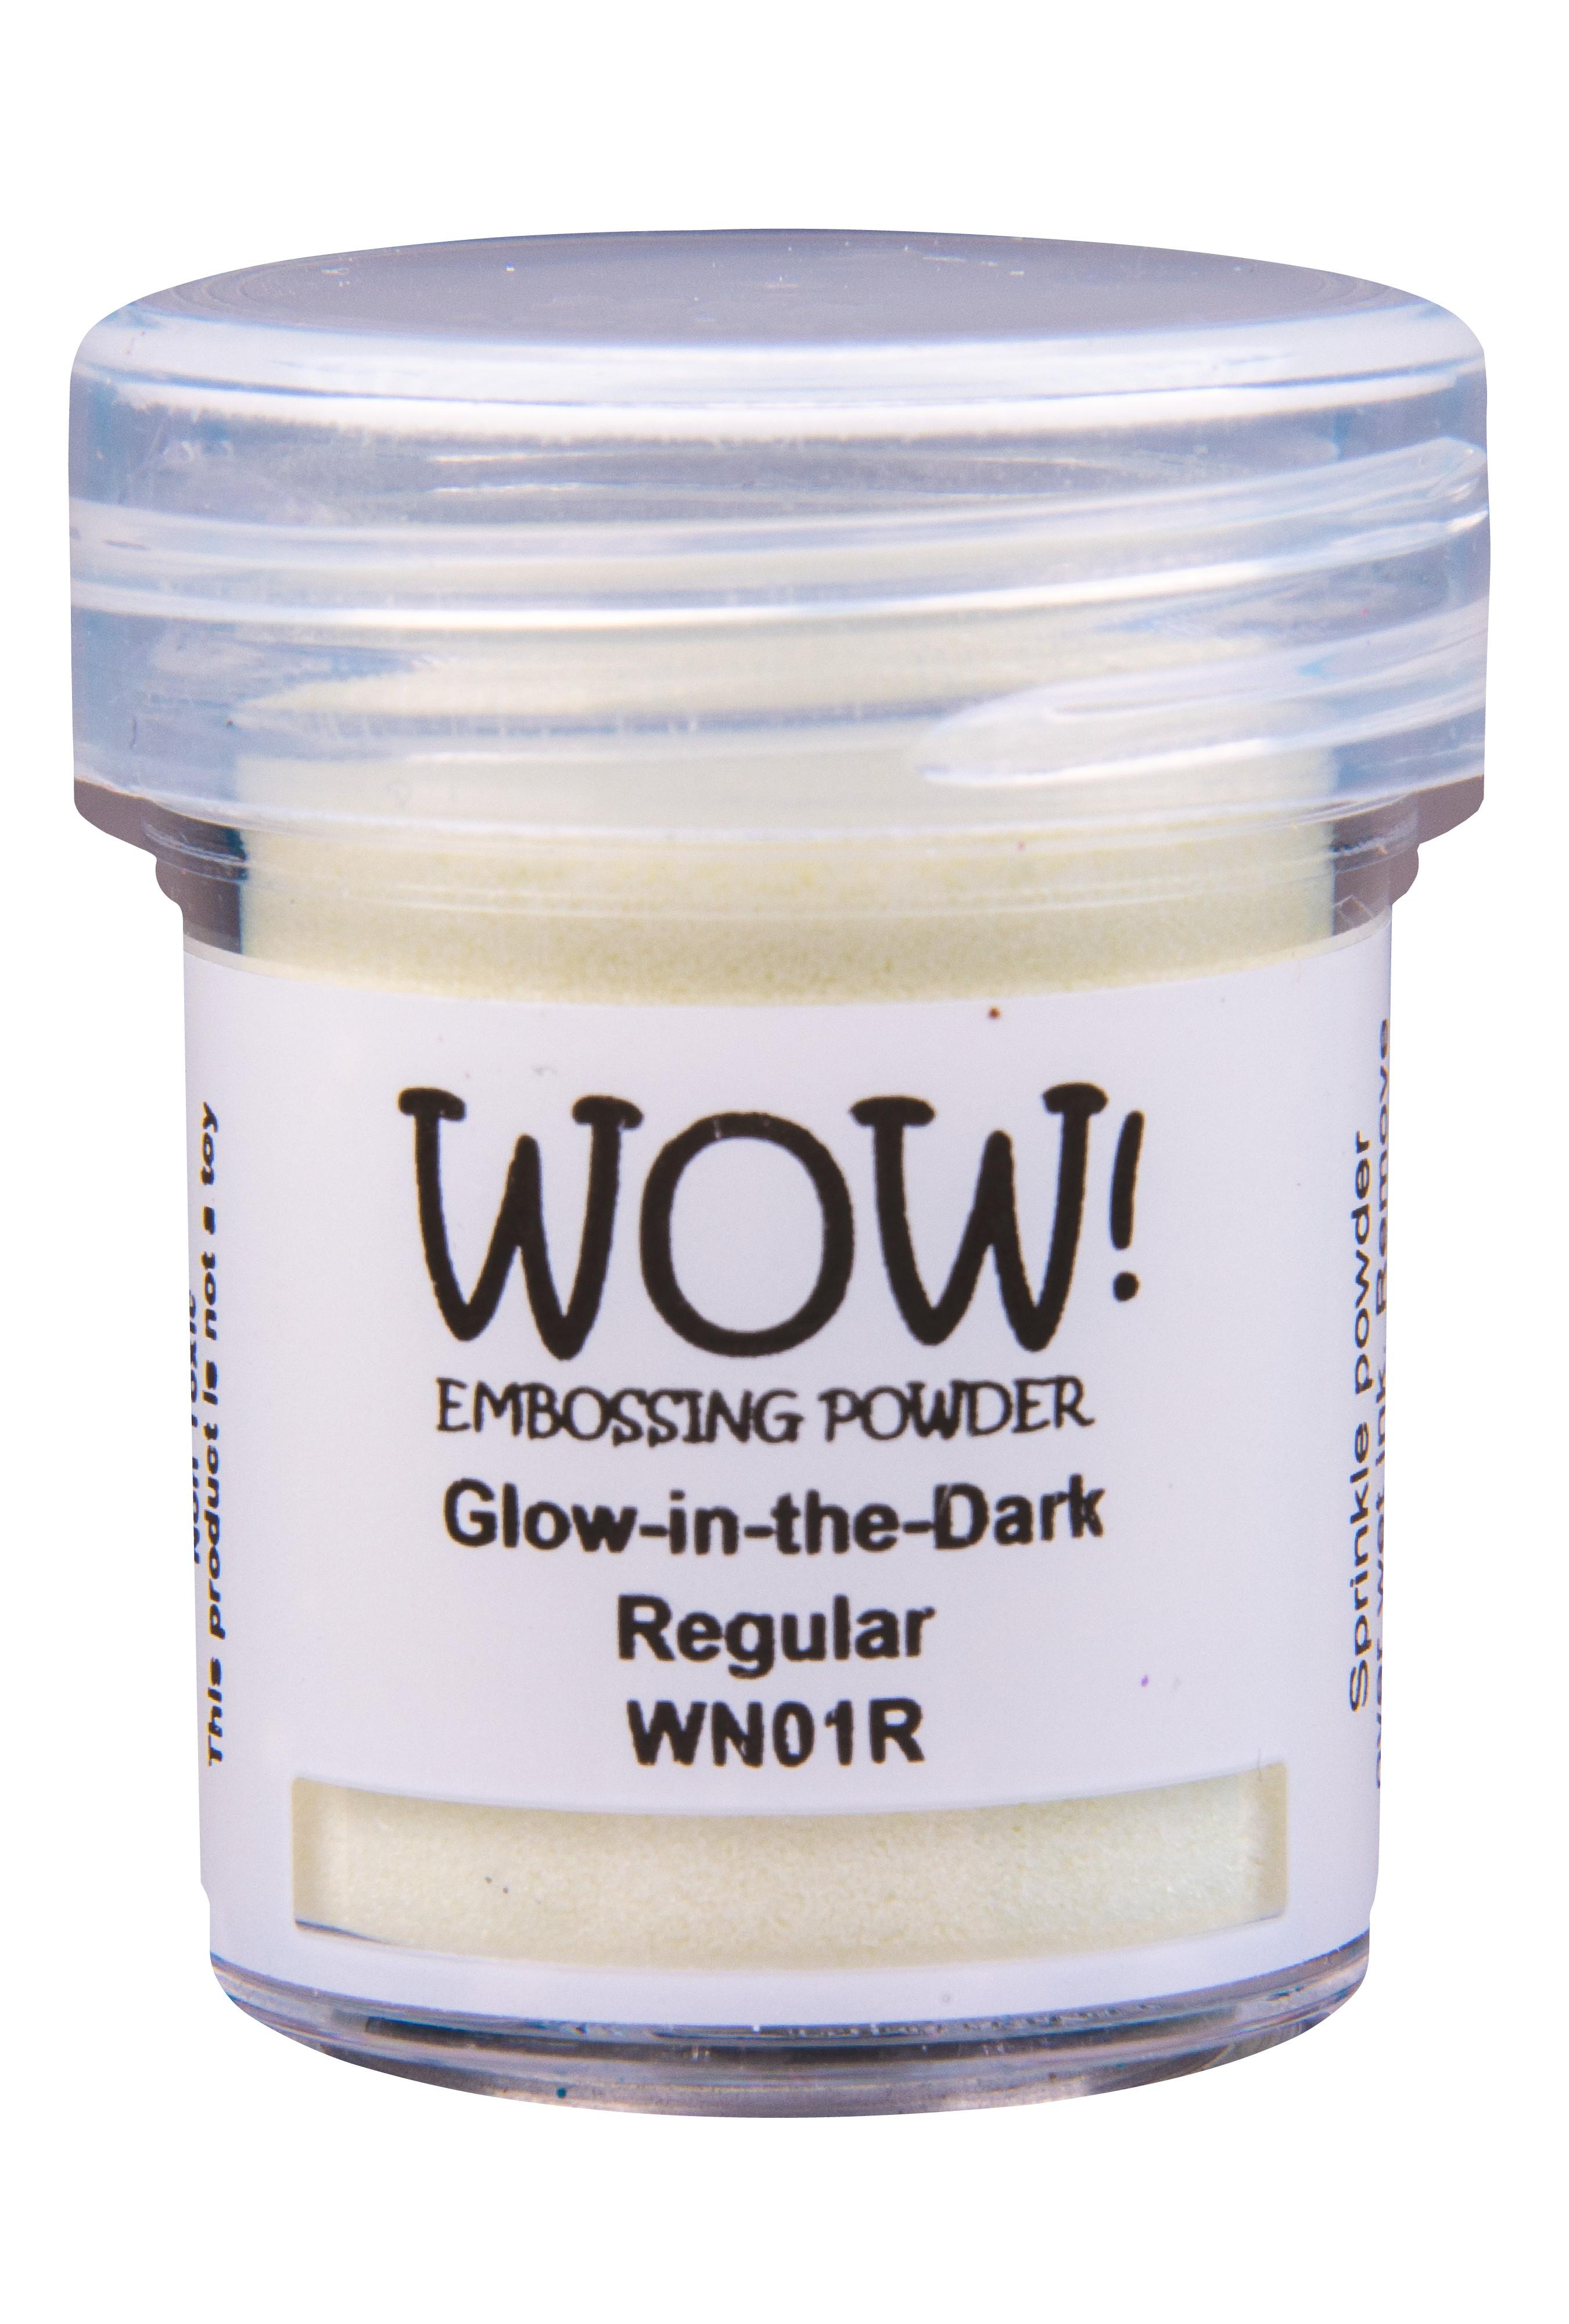 Special Effect Embossing Powder, Regular - Glow-In-The-Dark